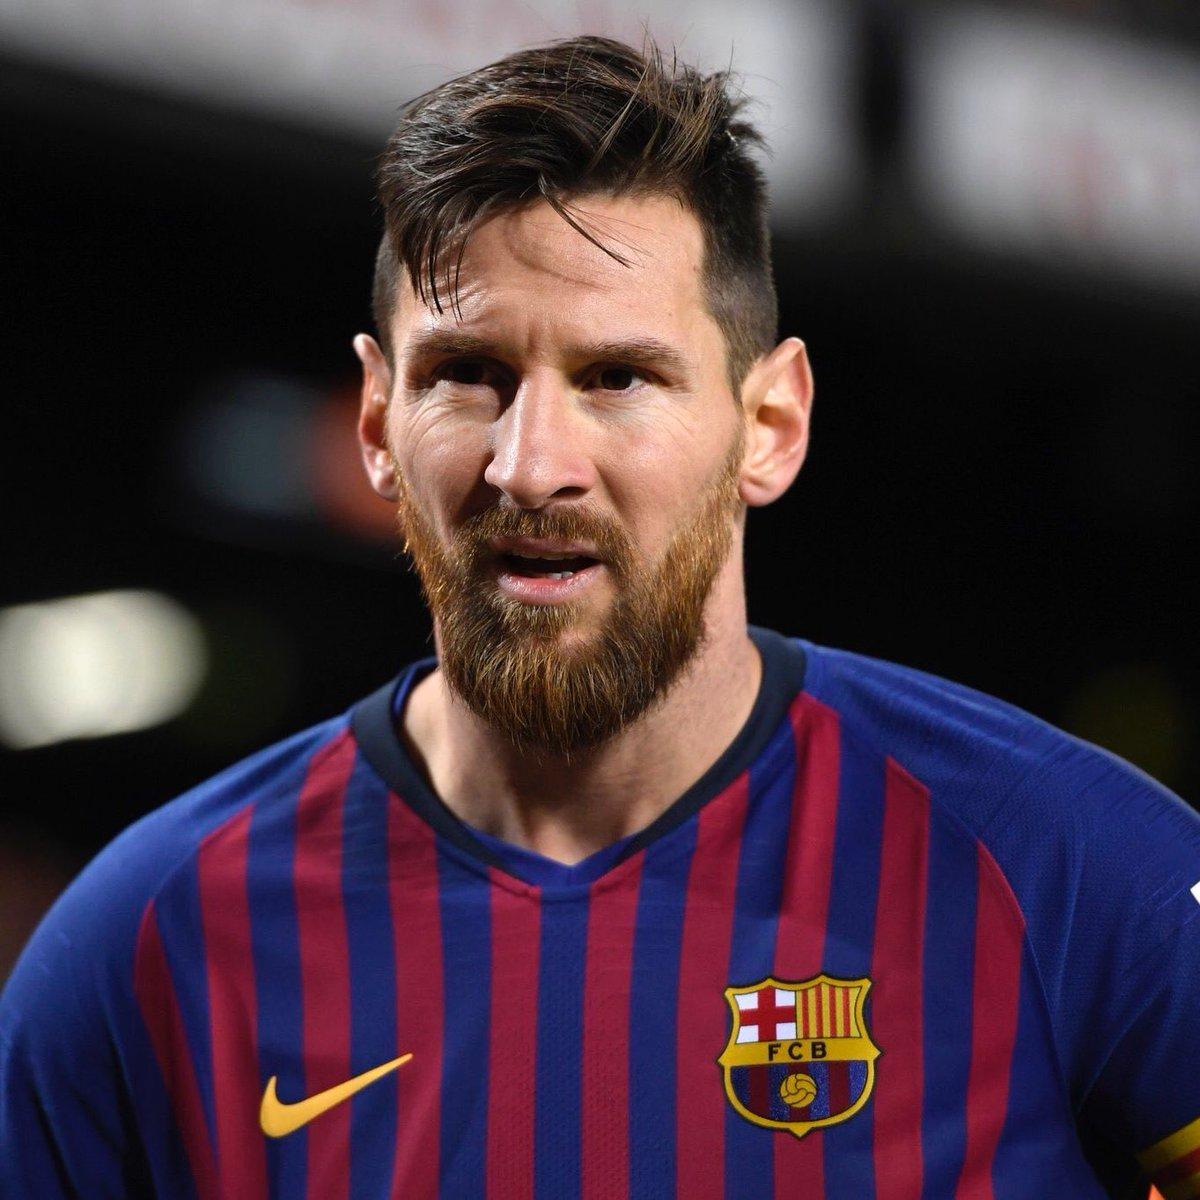 Leo Messi Avatar Lionel Messi Posters Messi Leo Messi